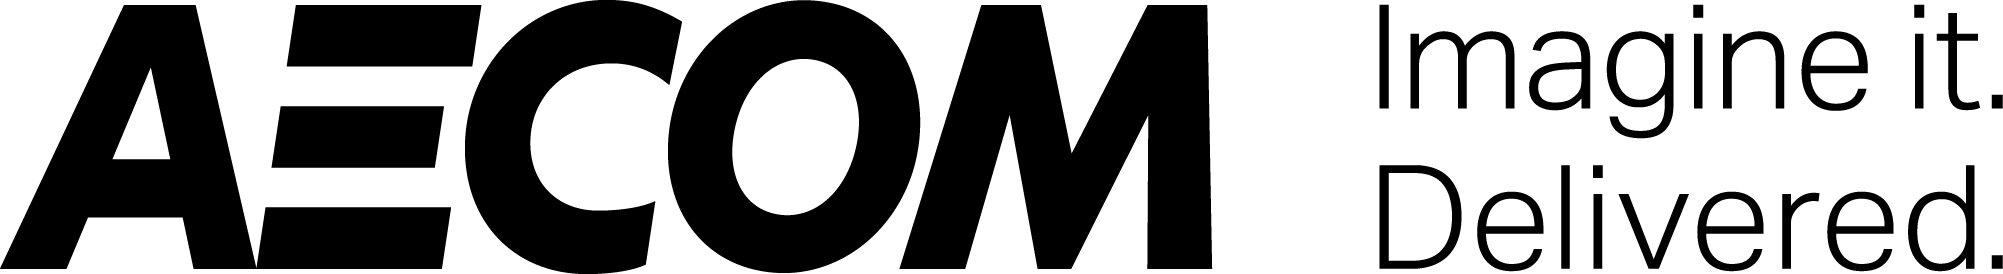 AECOM logo 2019.jpg